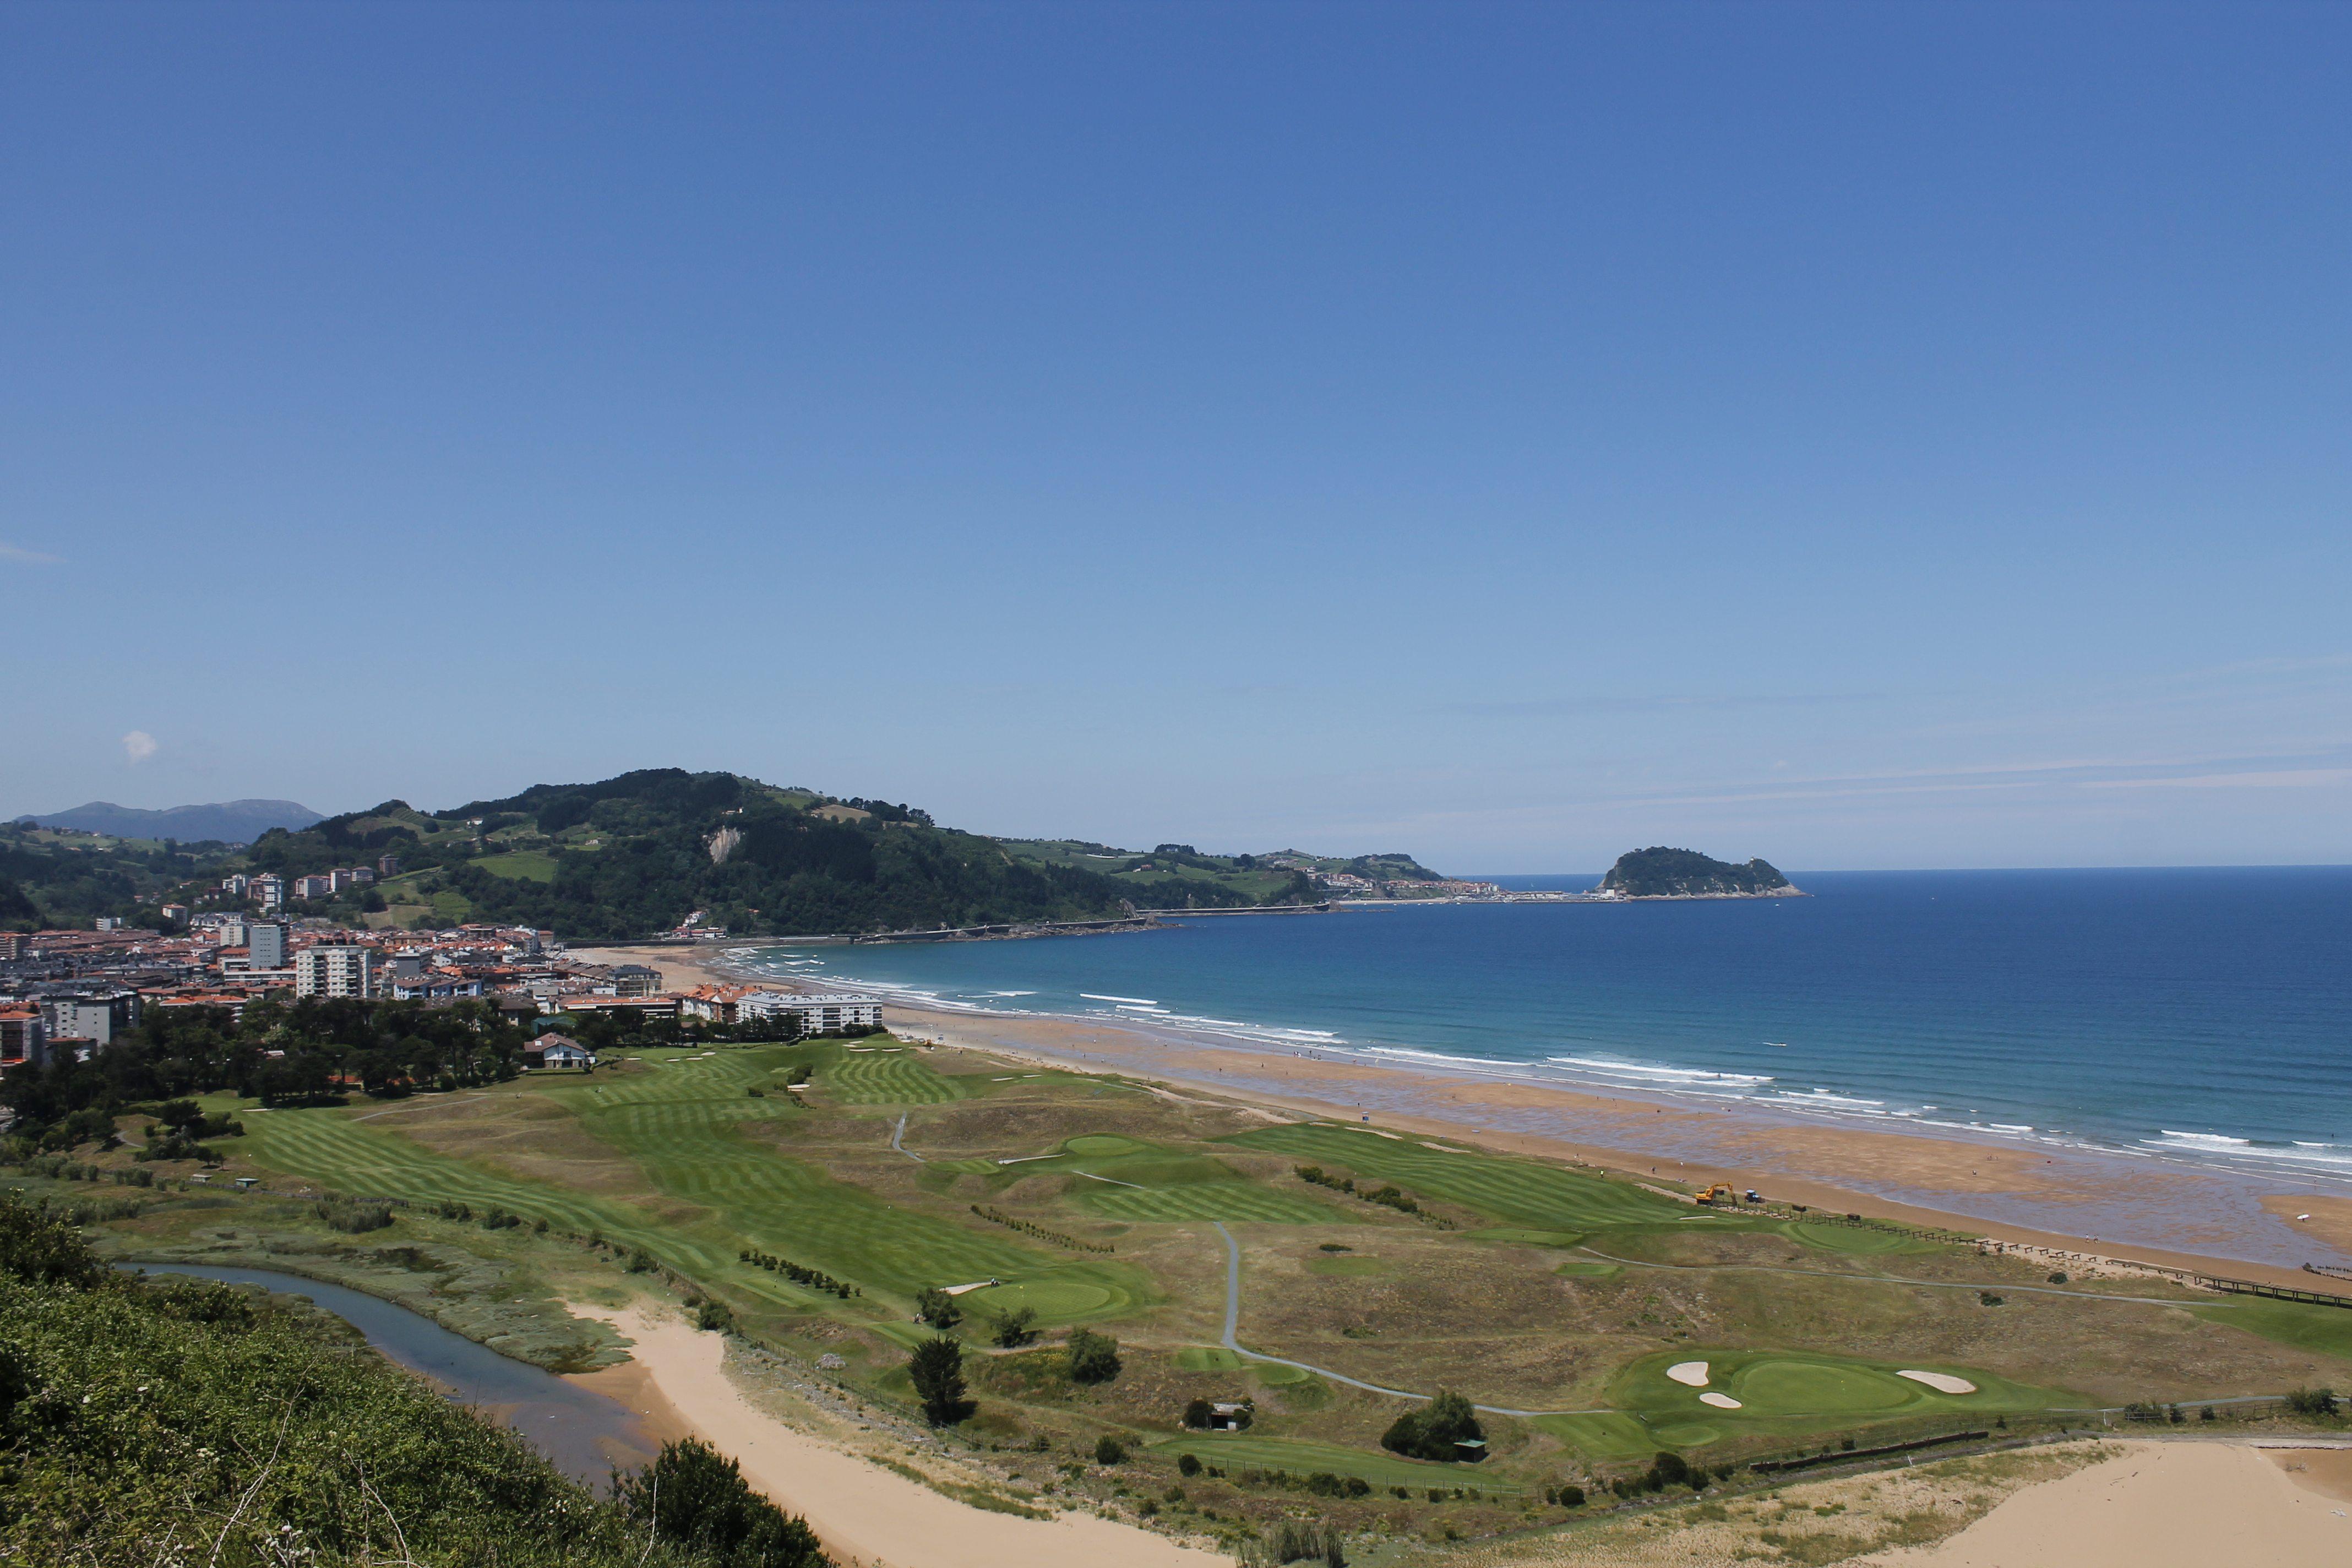 Zarautz Beach on the Camino de Norte